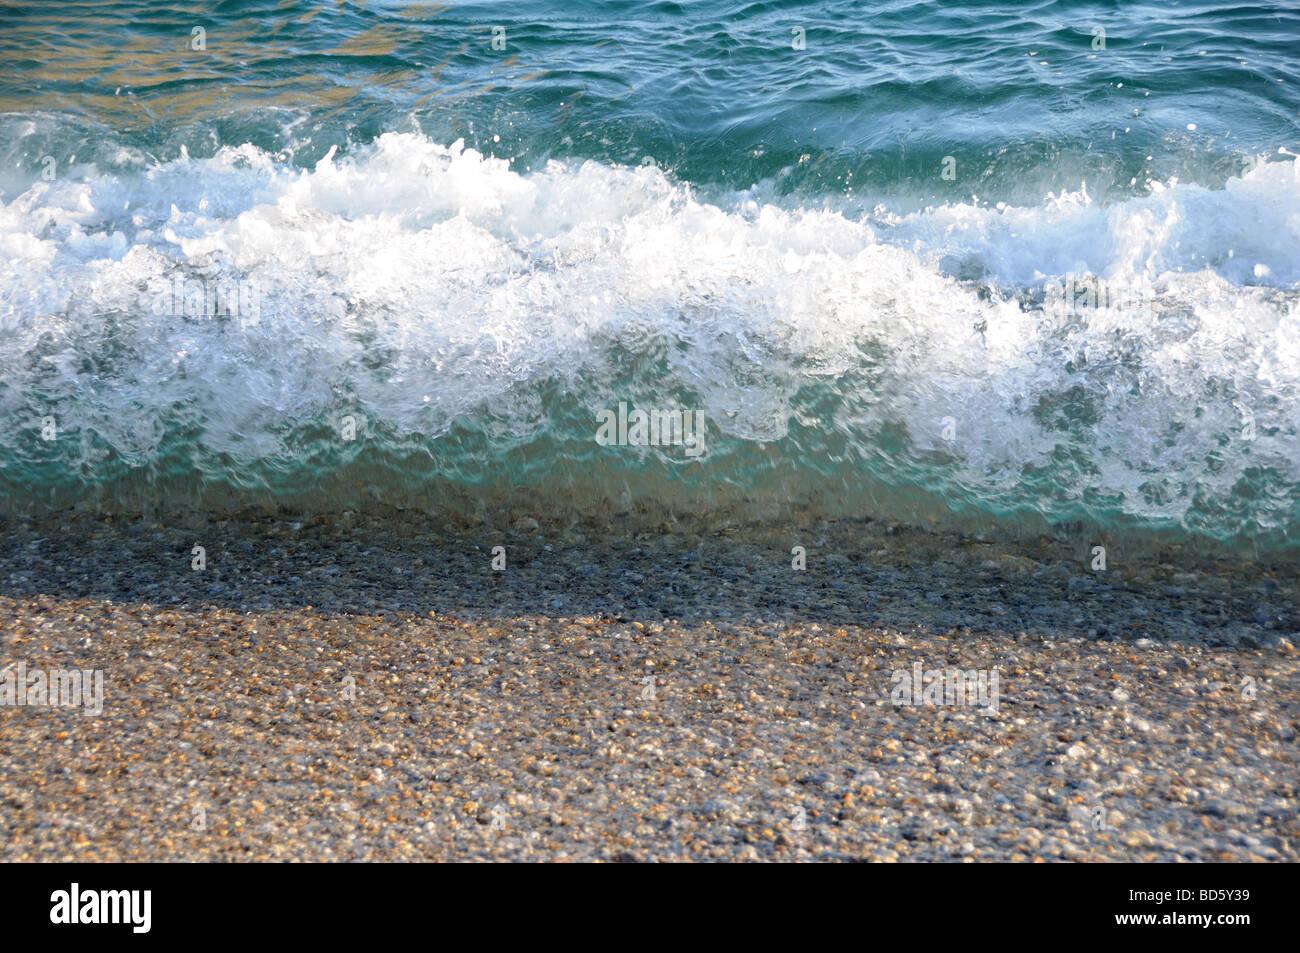 Breaking wave on shingle beach - Stock Image